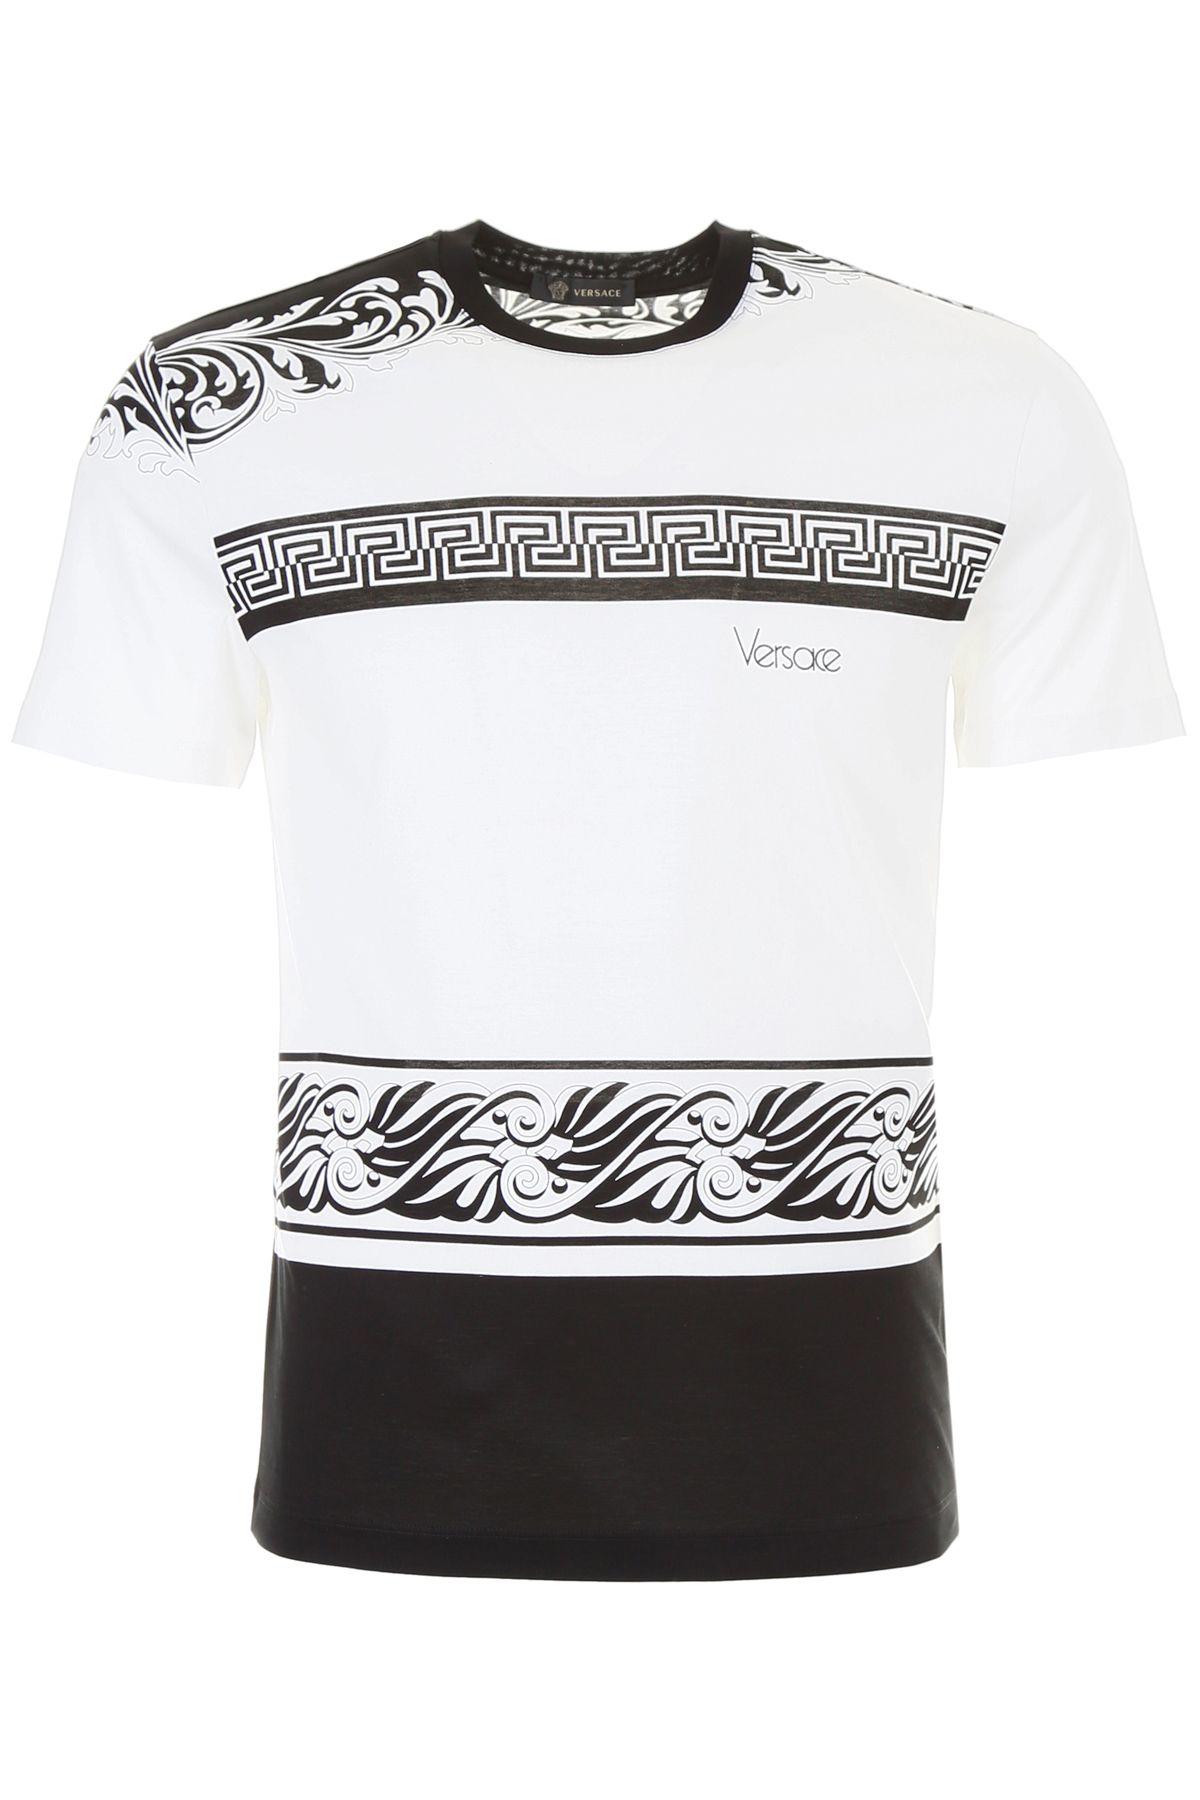 Versace T Shirt Versace Cloth Versace T Shirt Versace Colorful Shirts